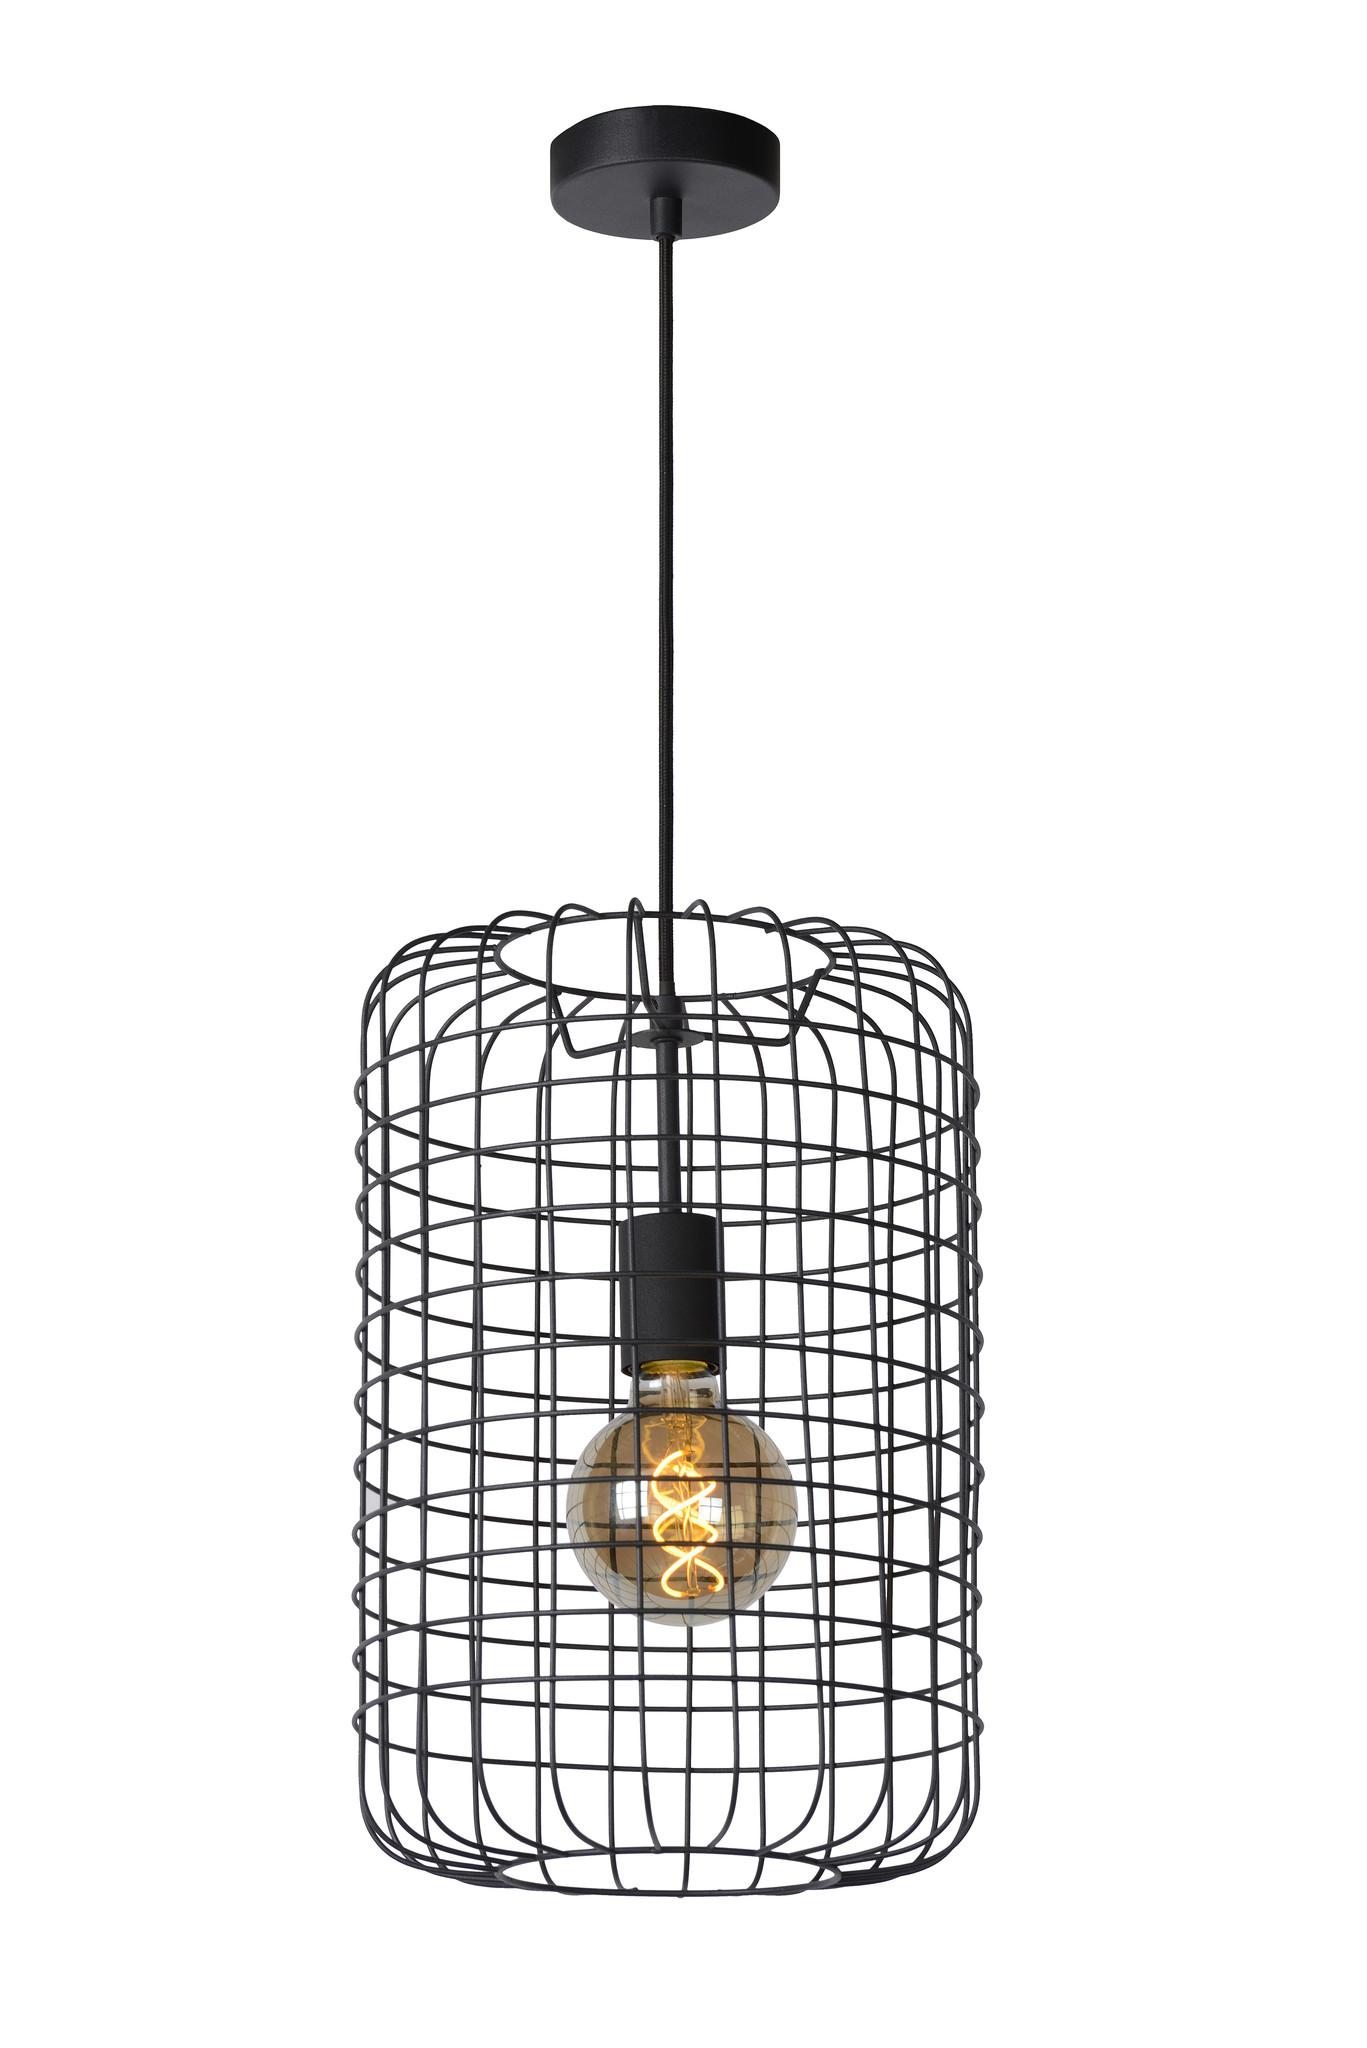 Hanglamp Esmee Zwart 26cm Ø      5411212021915